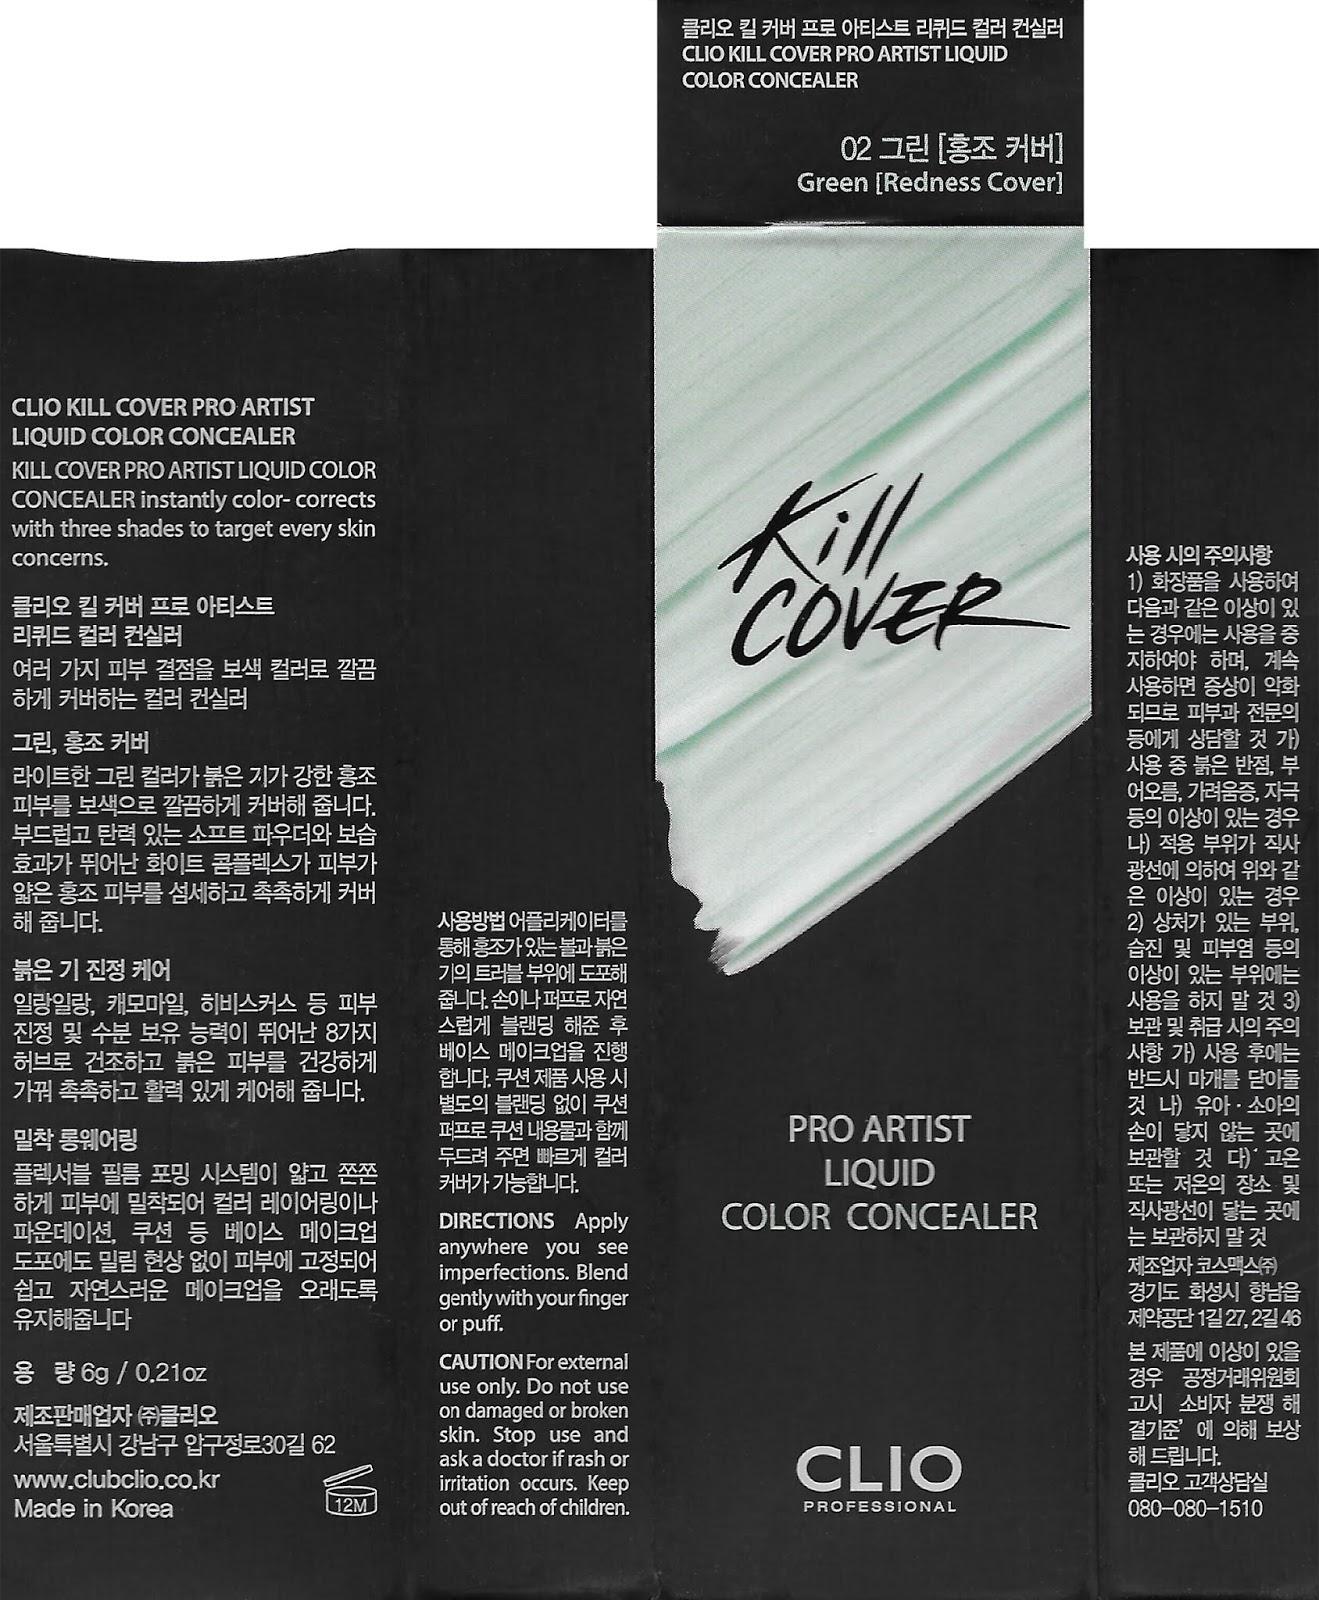 lavlilacs Review Clio Kill Cover Pro Artist Liquid Color Concealer - 002 Mint packaging box